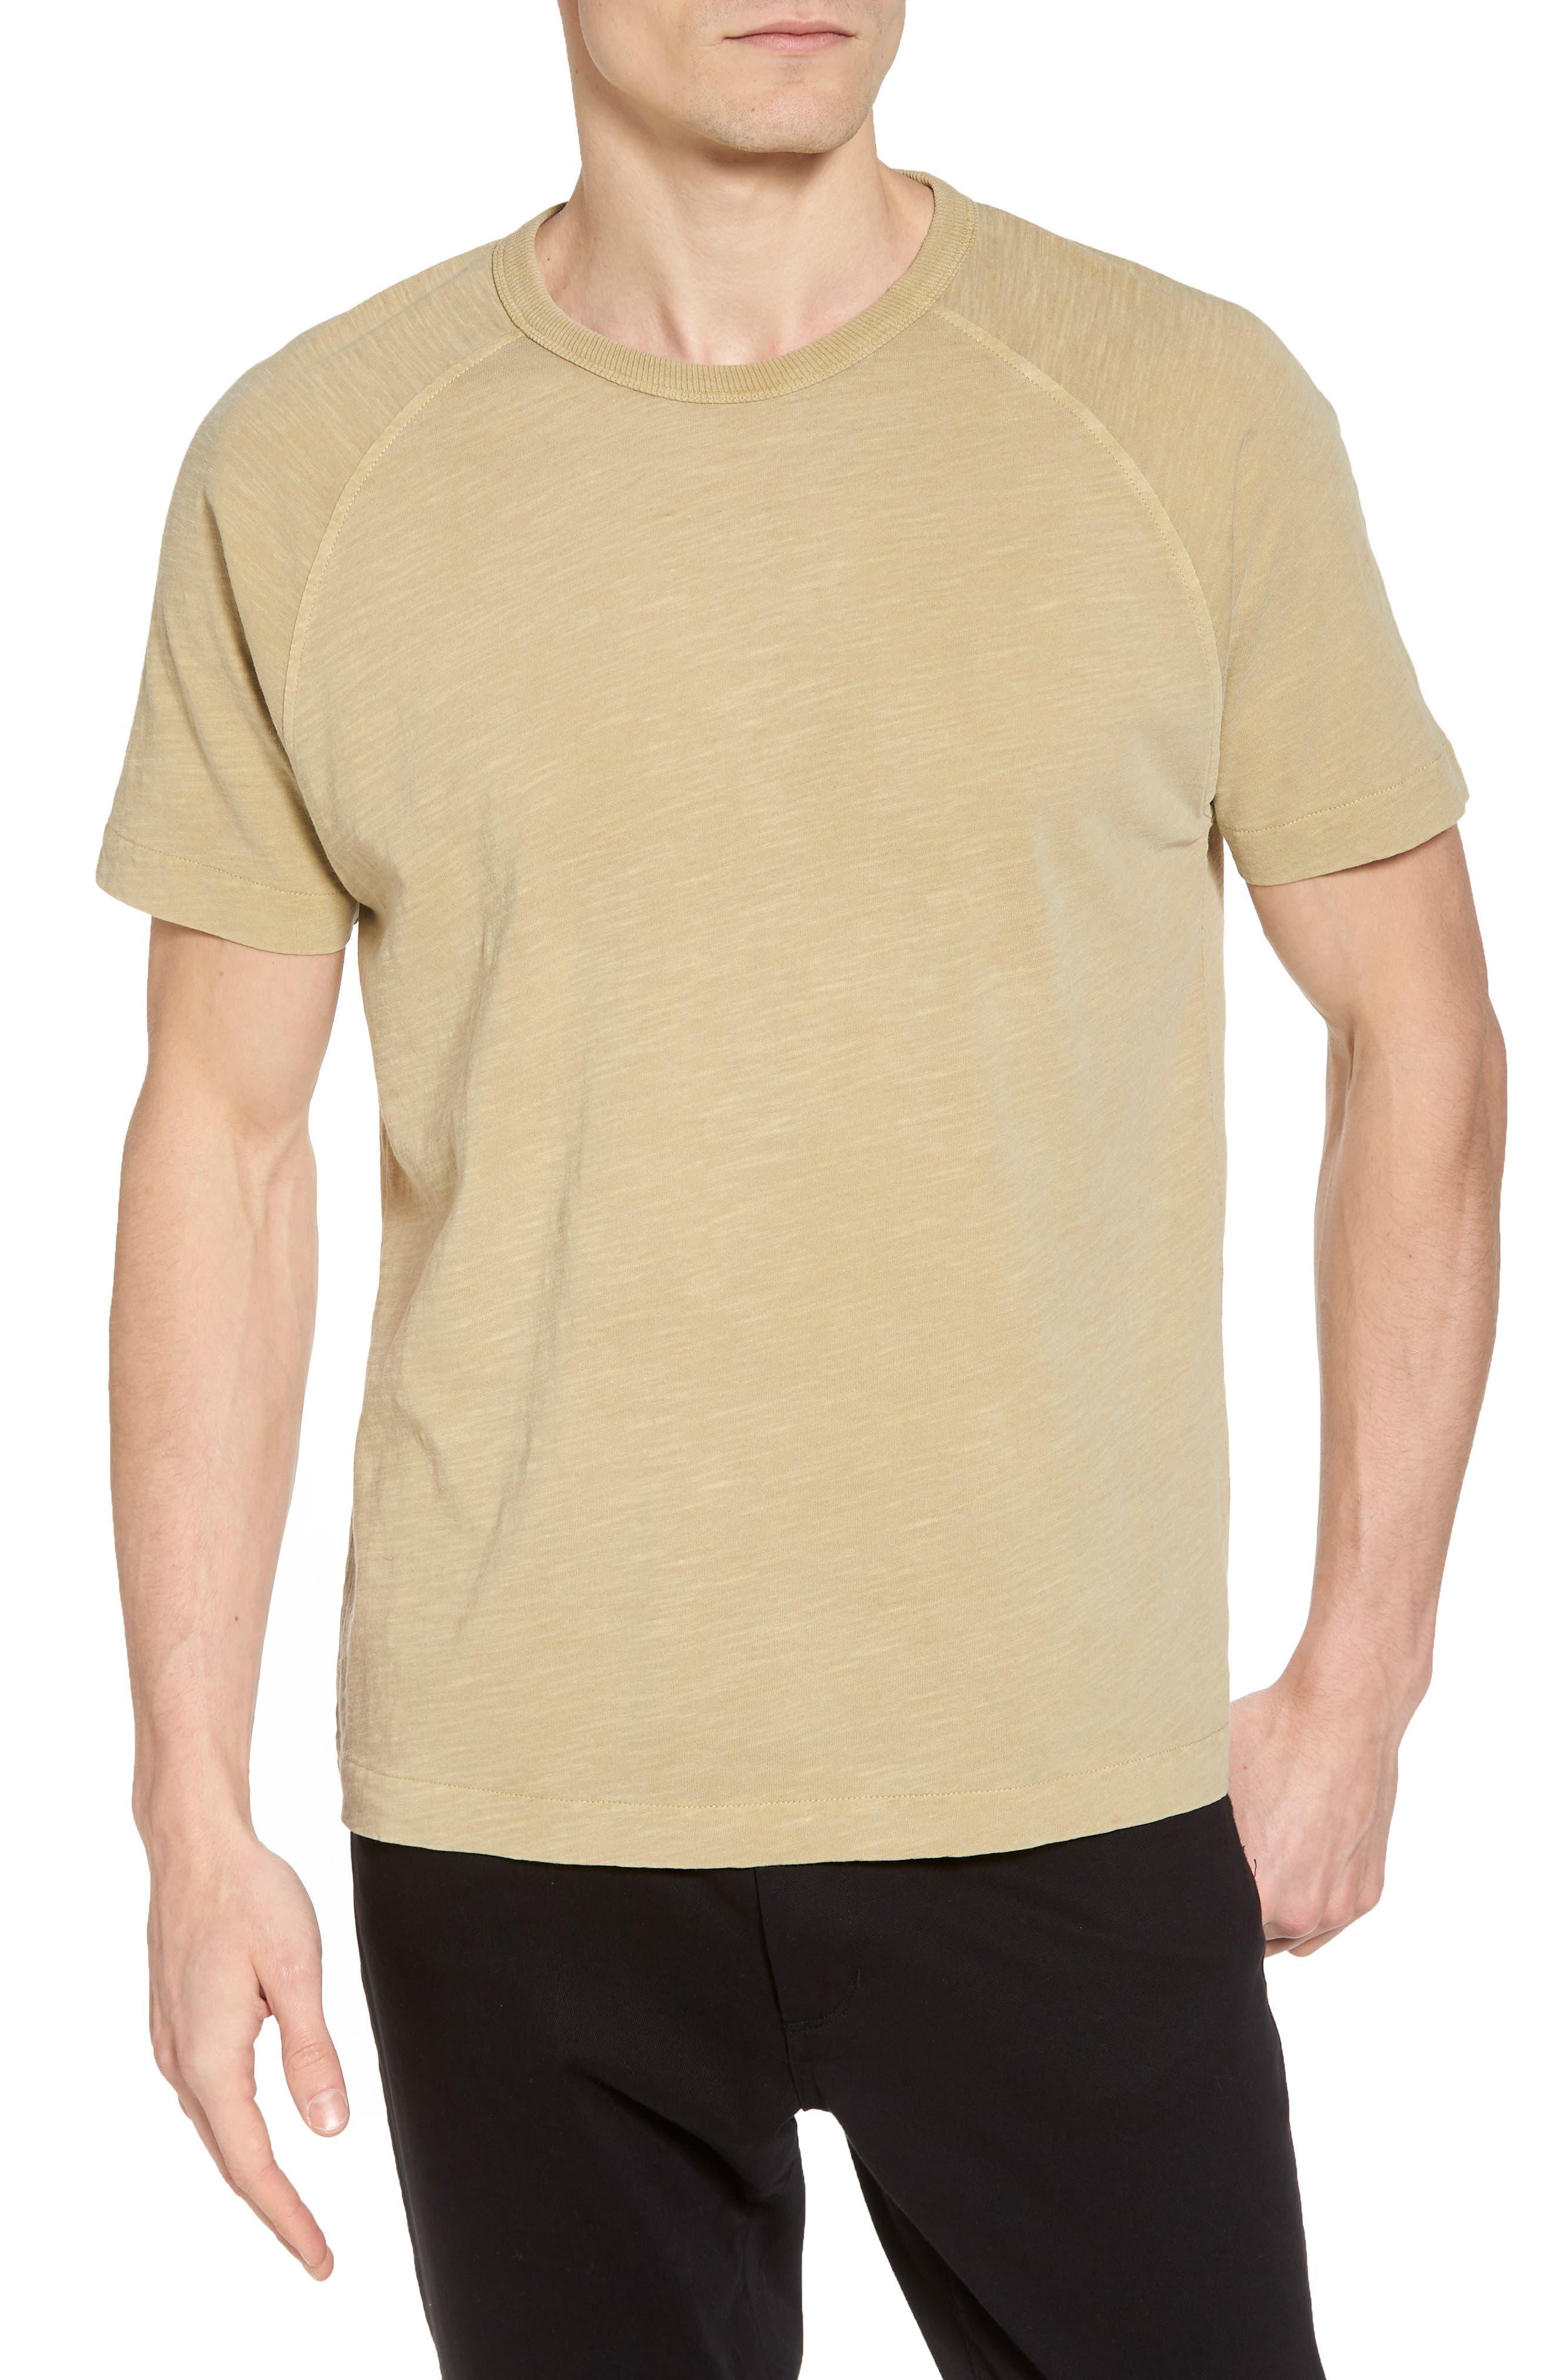 YMC Television Raglan T-Shirt, Main, color, 250